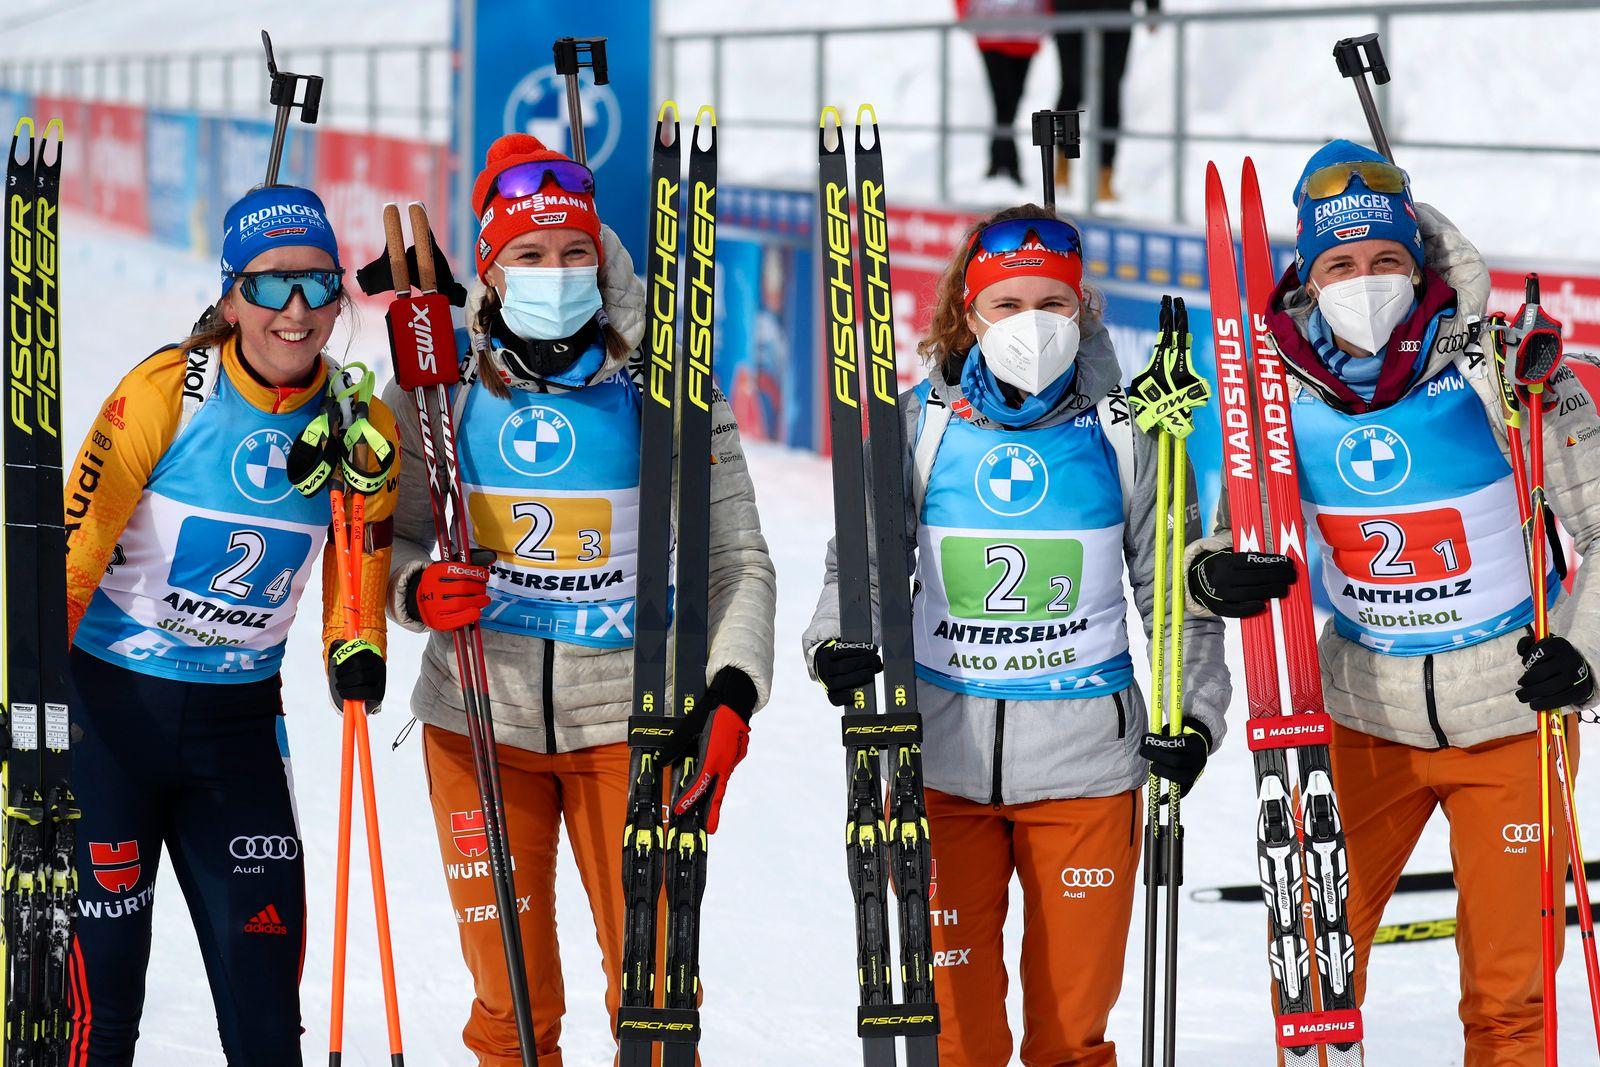 Biathlon-Weltcup in Italien